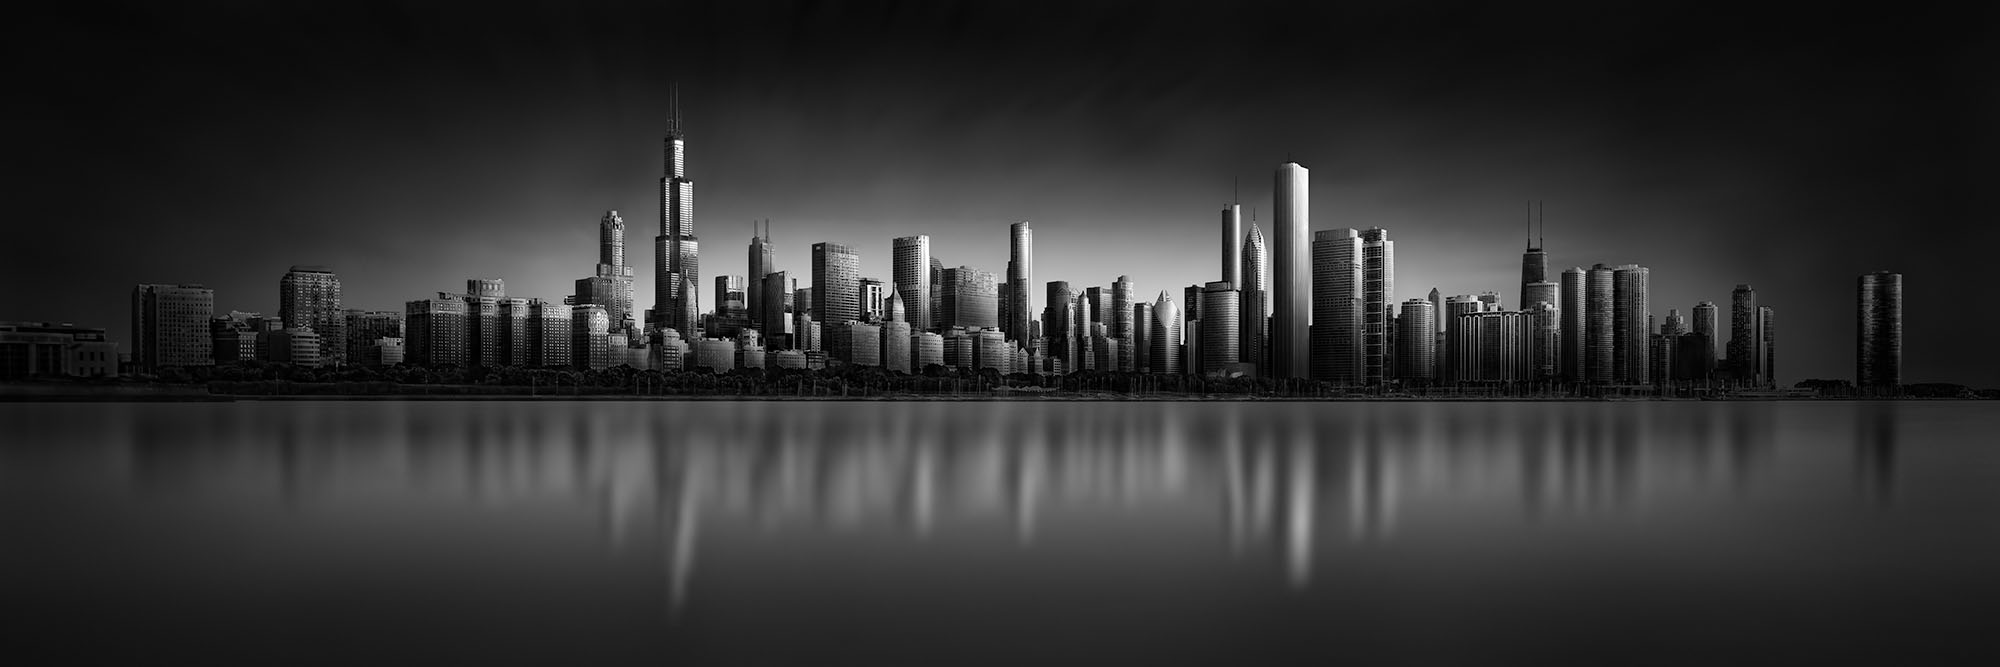 Mirroring Fantasy - Chicago Skyline © Julia Anna Gospodarou - (en)Visionography